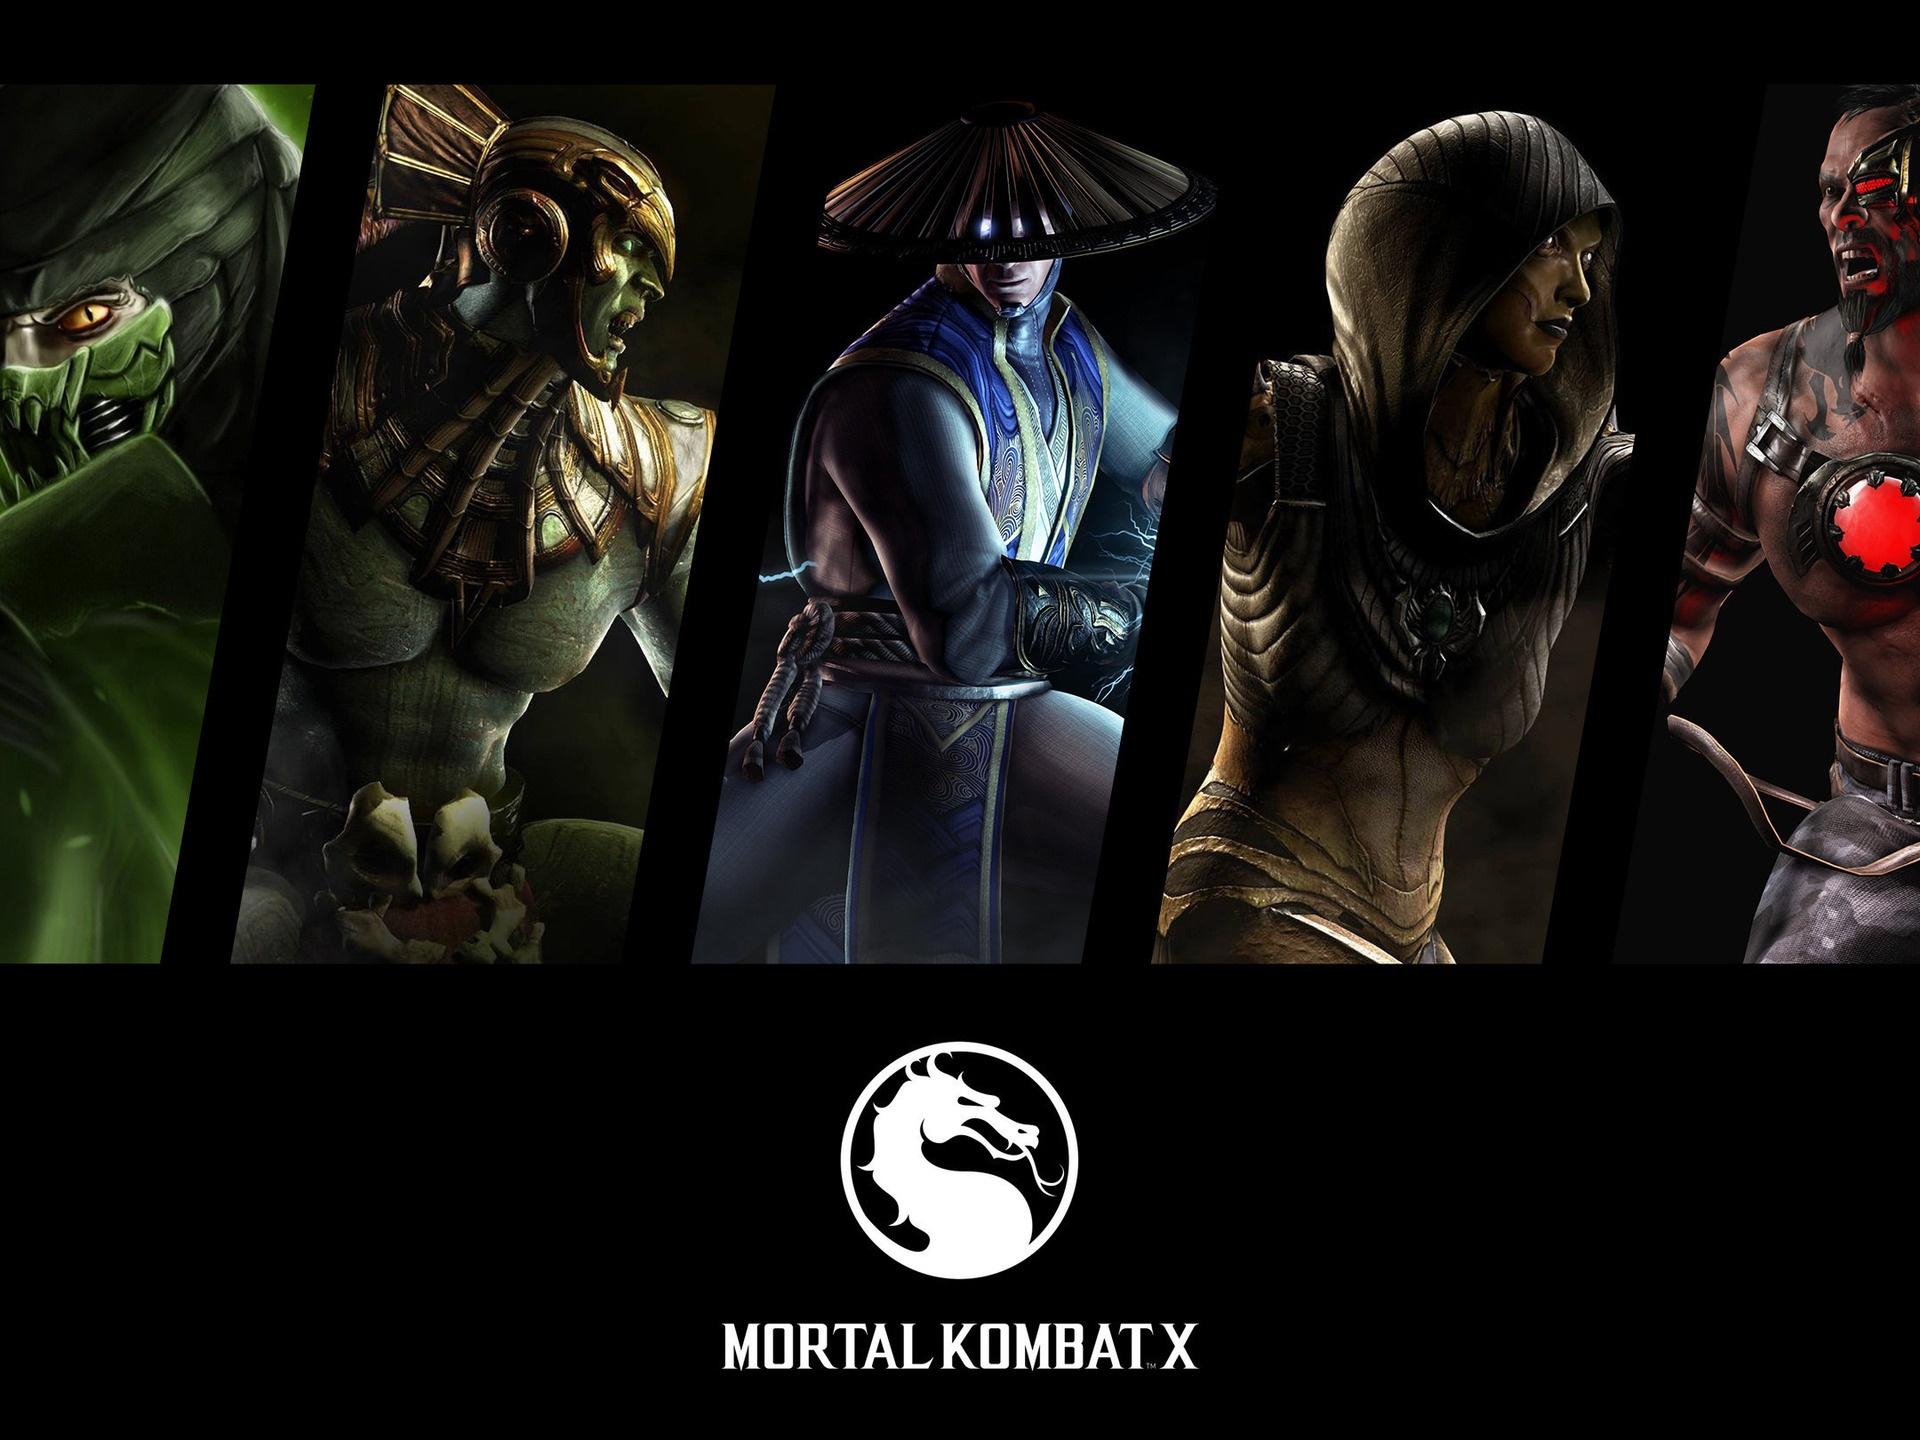 1920x1440 Mortal Kombat X desktop PC and Mac wallpaper 1920x1440